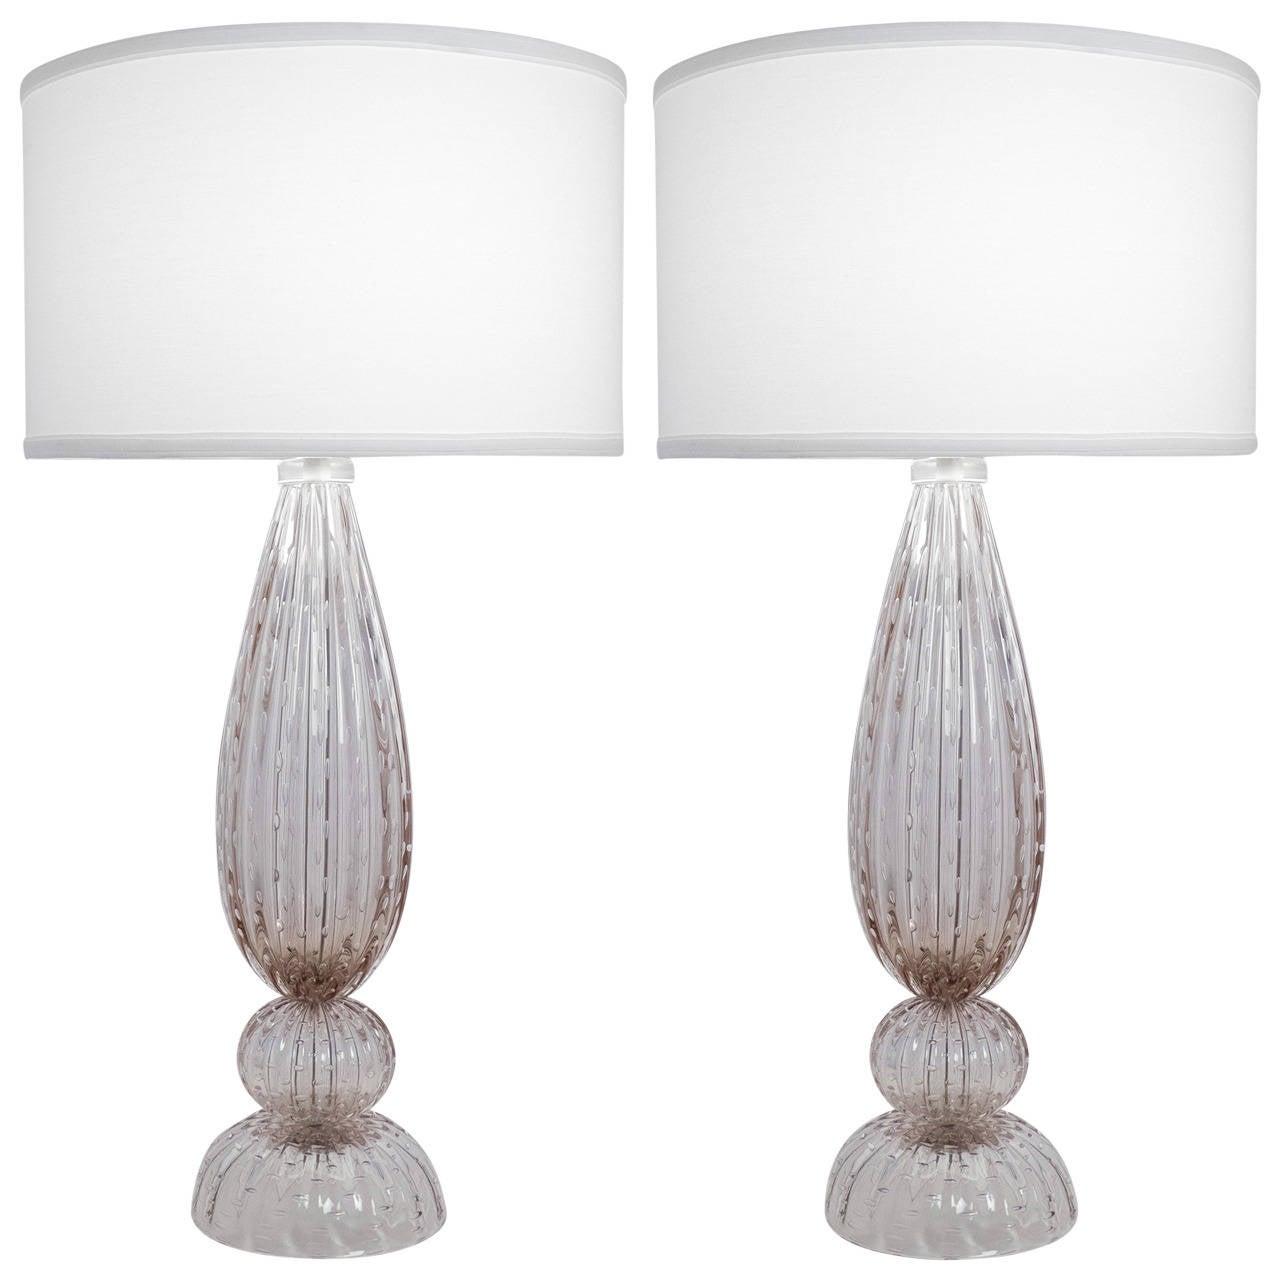 Murano Pulegoso Glass Table Lamps At 1stdibs